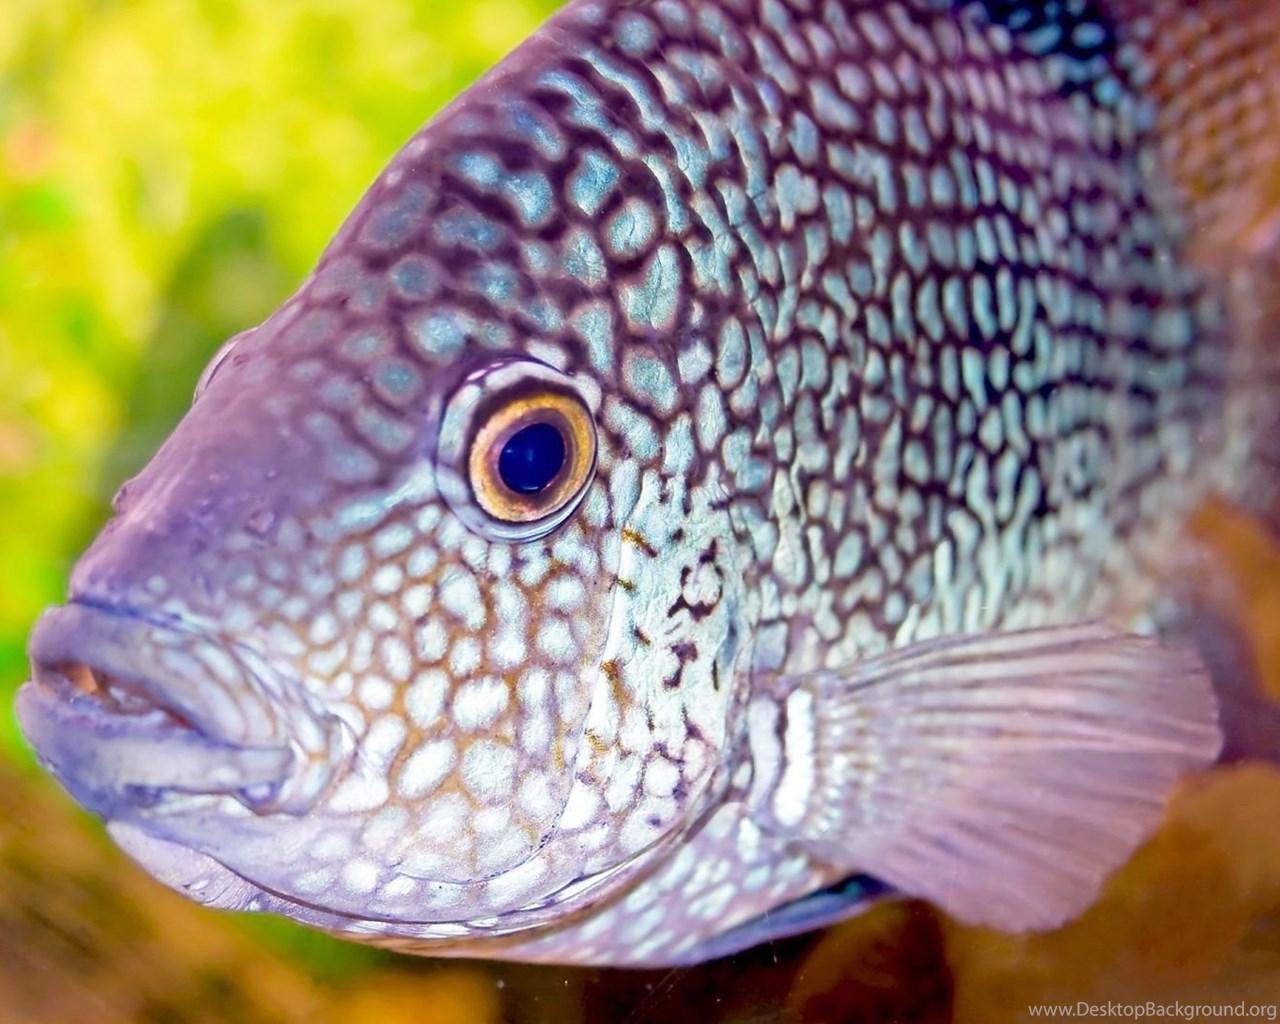 1920x1080 Aquarium Fish Hd Wallpapers Desktop Background